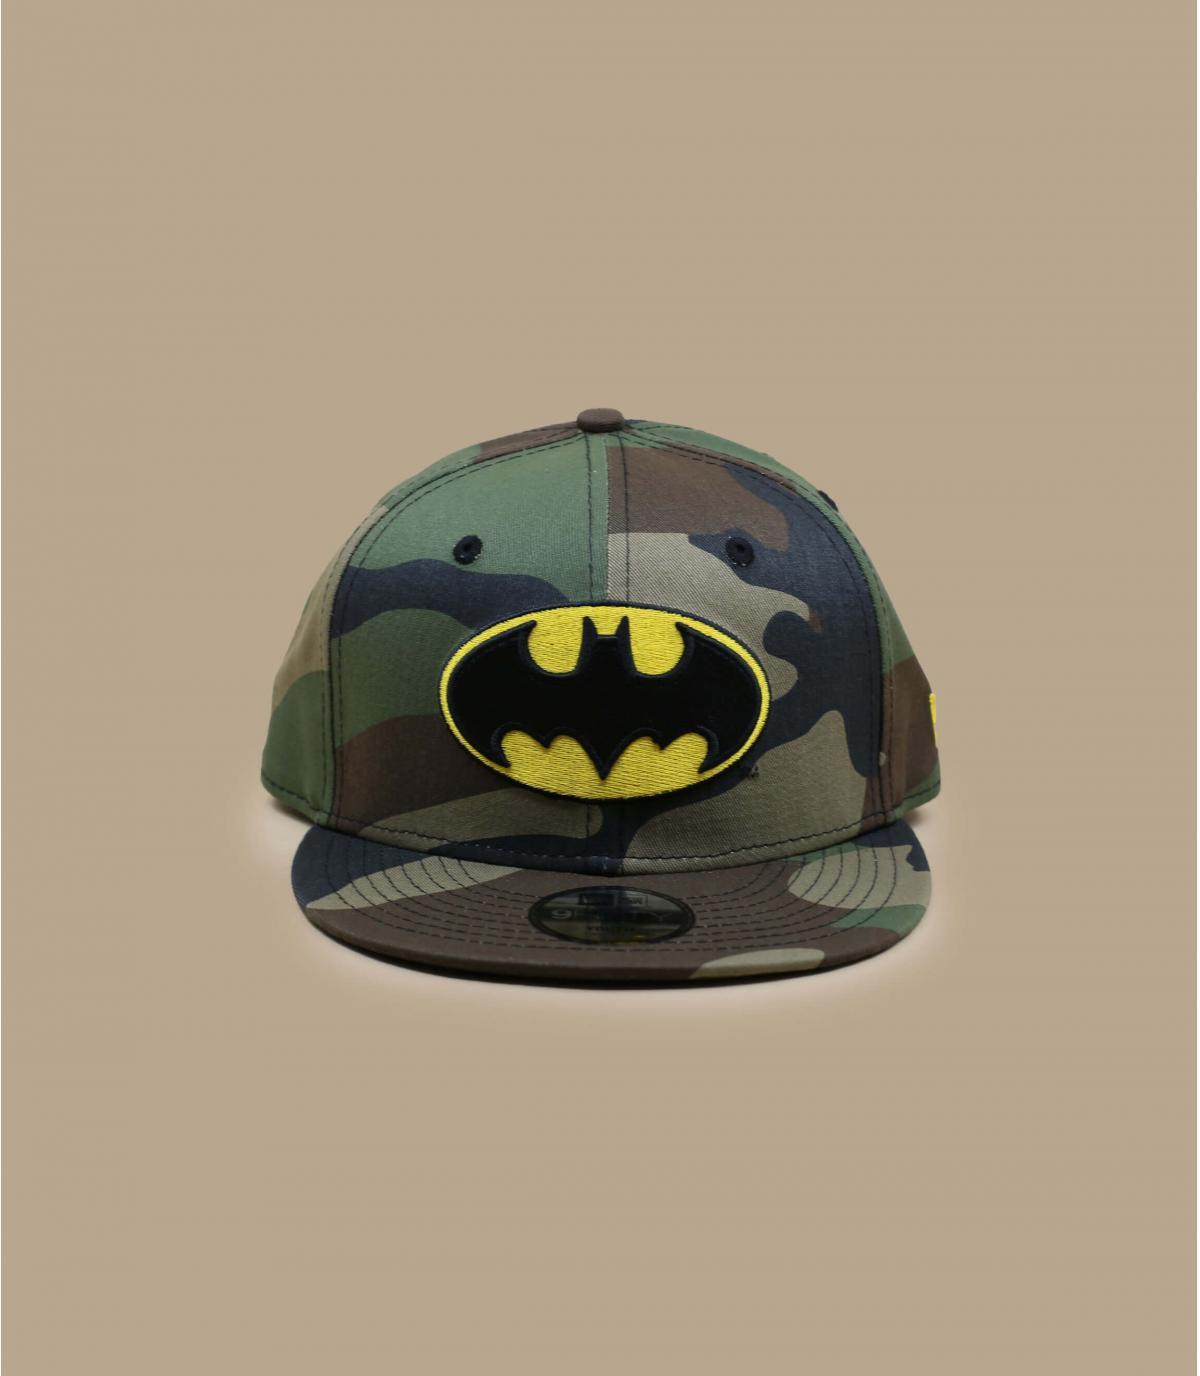 Details Snapback Kids Batman Camo 950 woodland - Abbildung 2